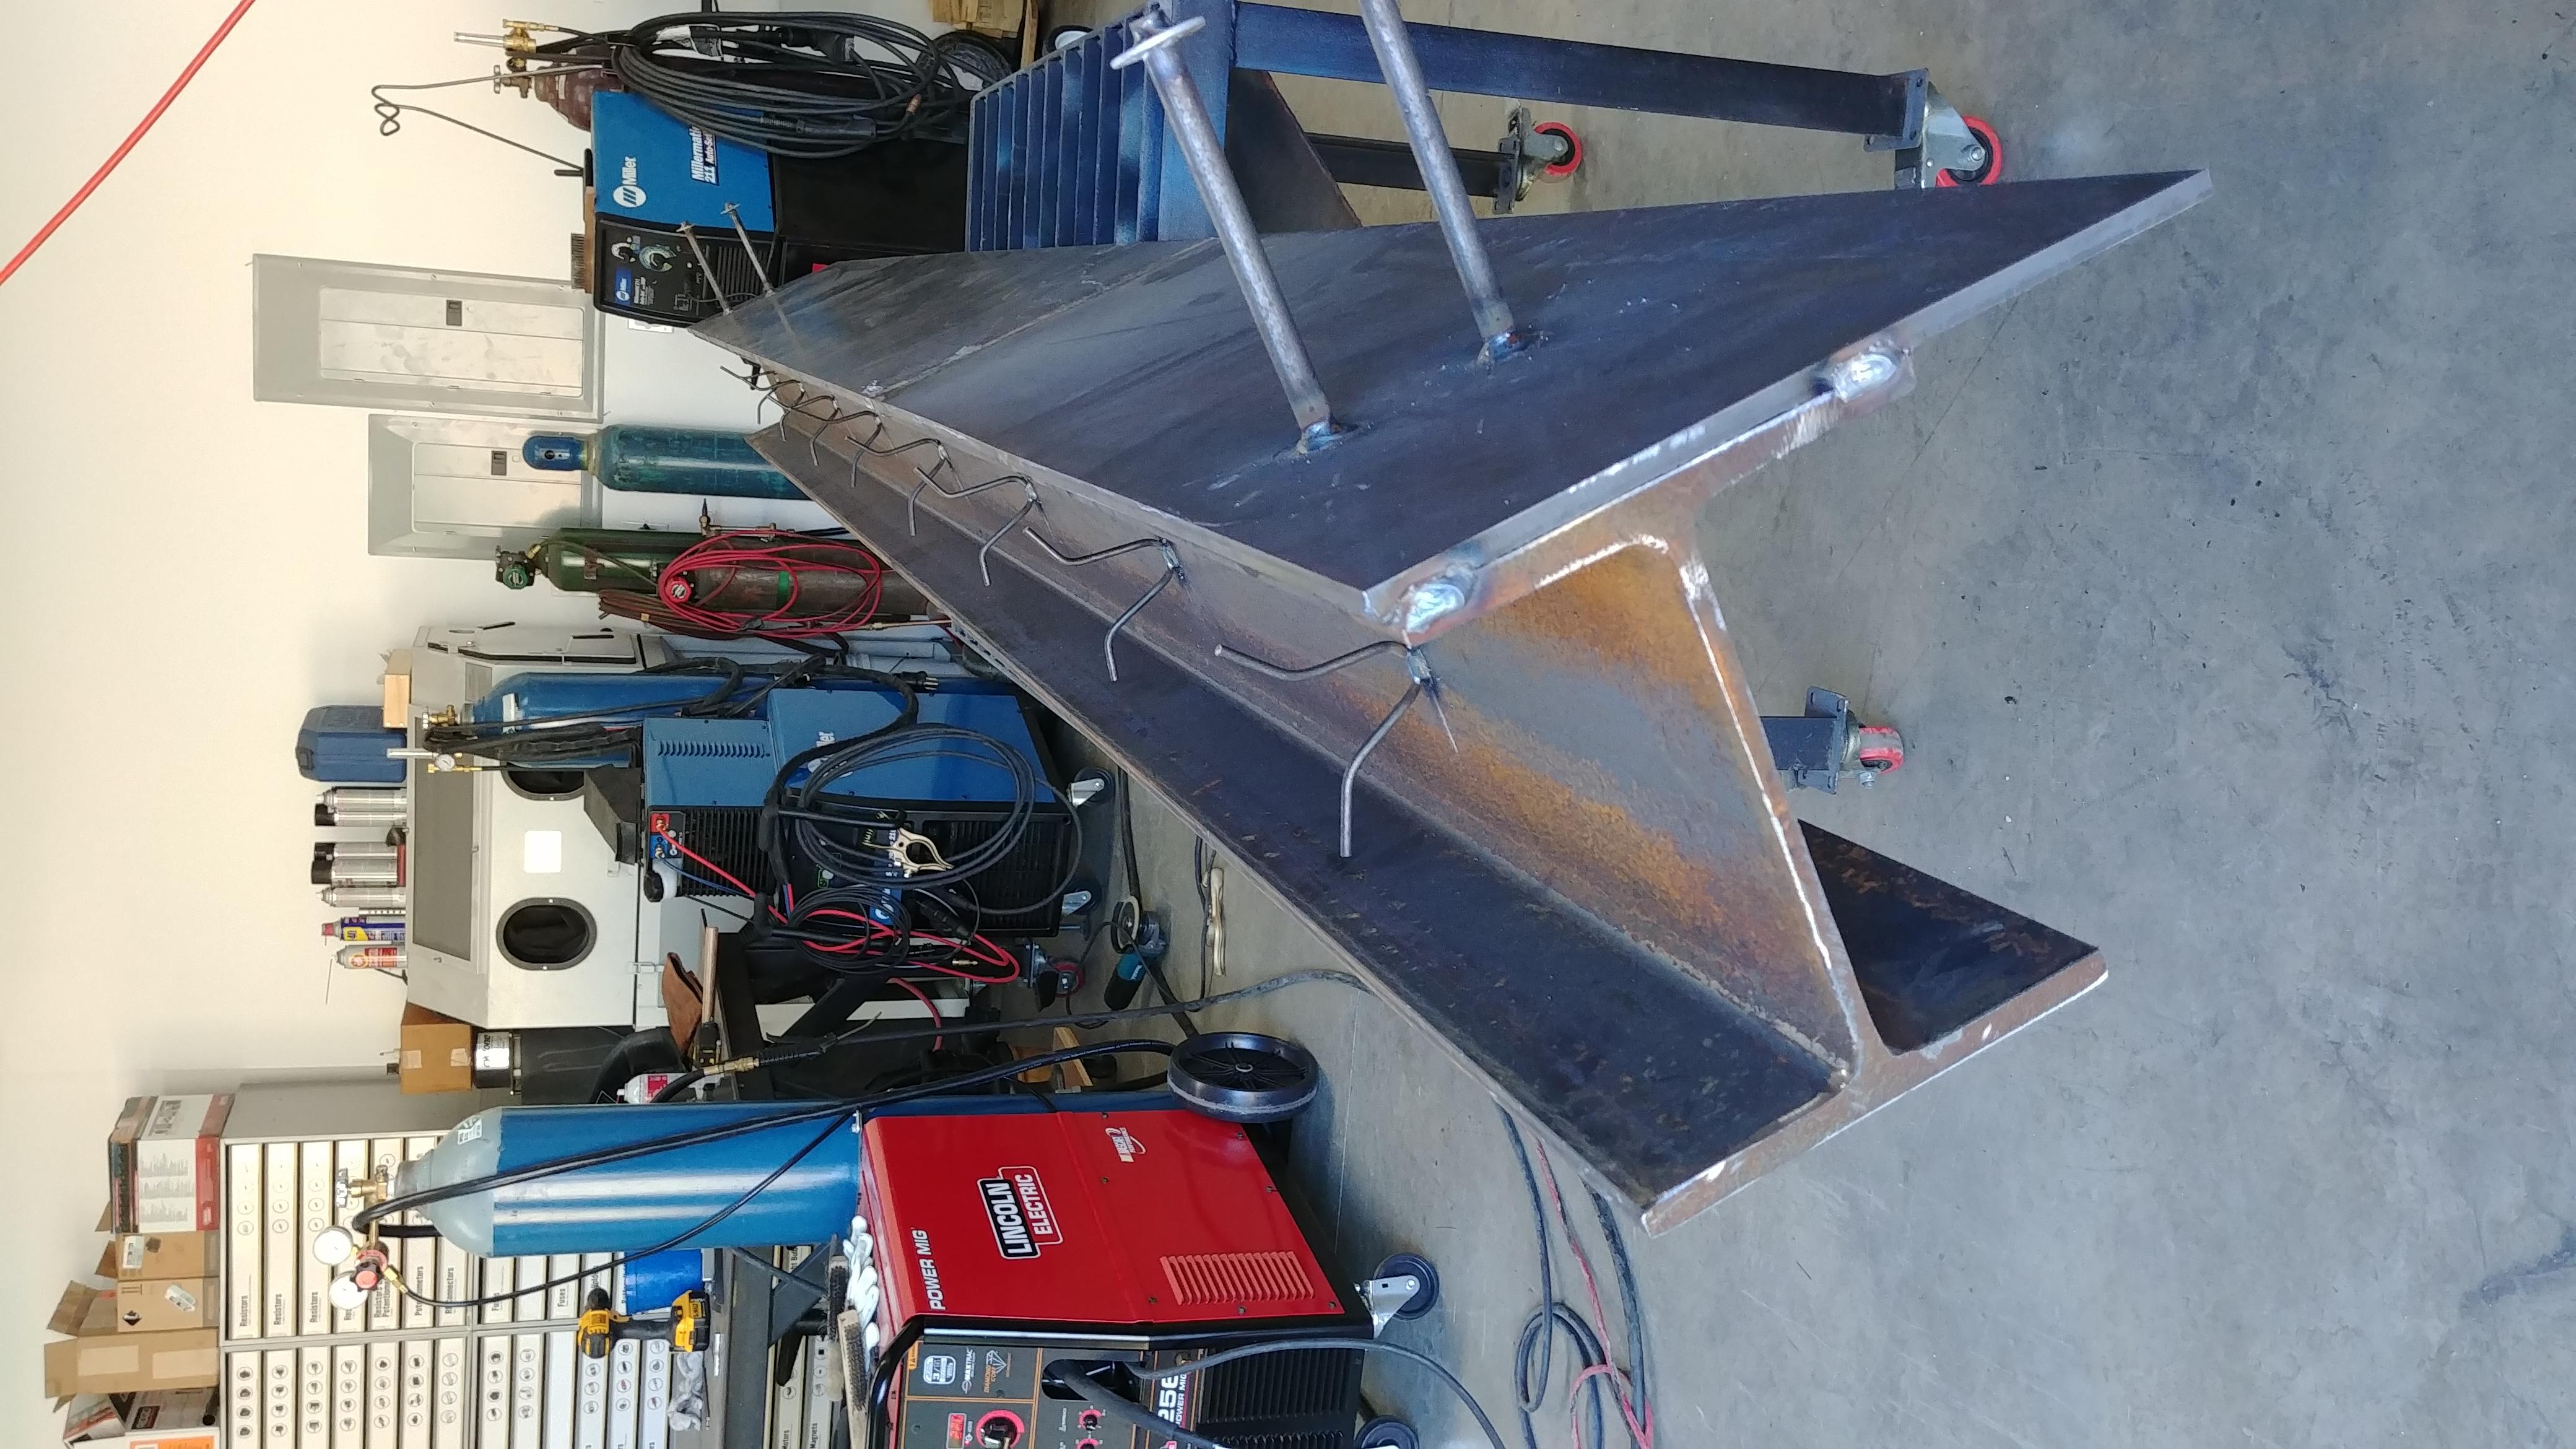 Steel weldments